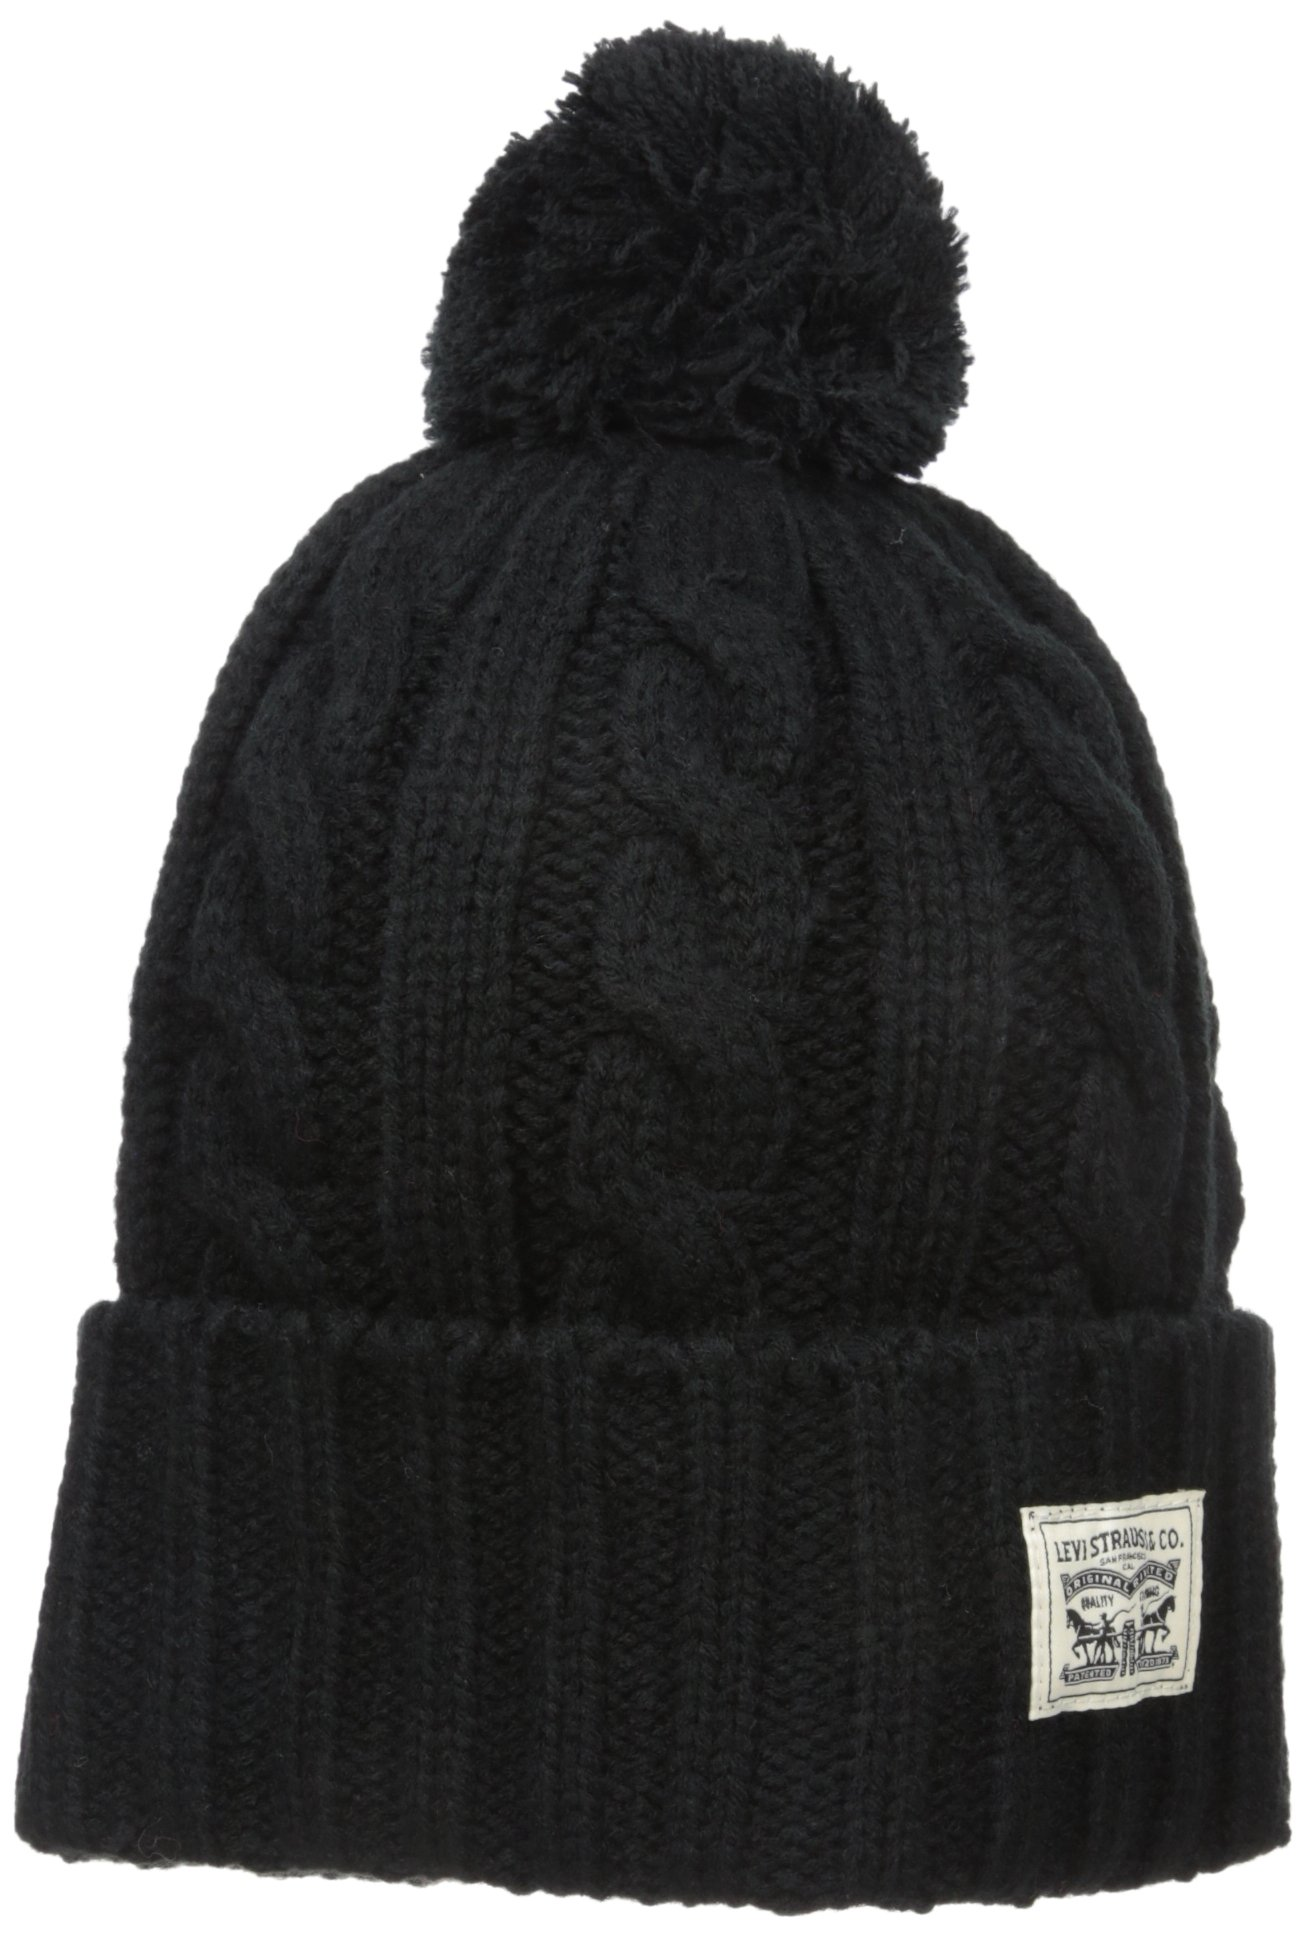 17b912666734 Galleon - Levi's Men's Pompom Cable Beanie Hat, Black, One Size